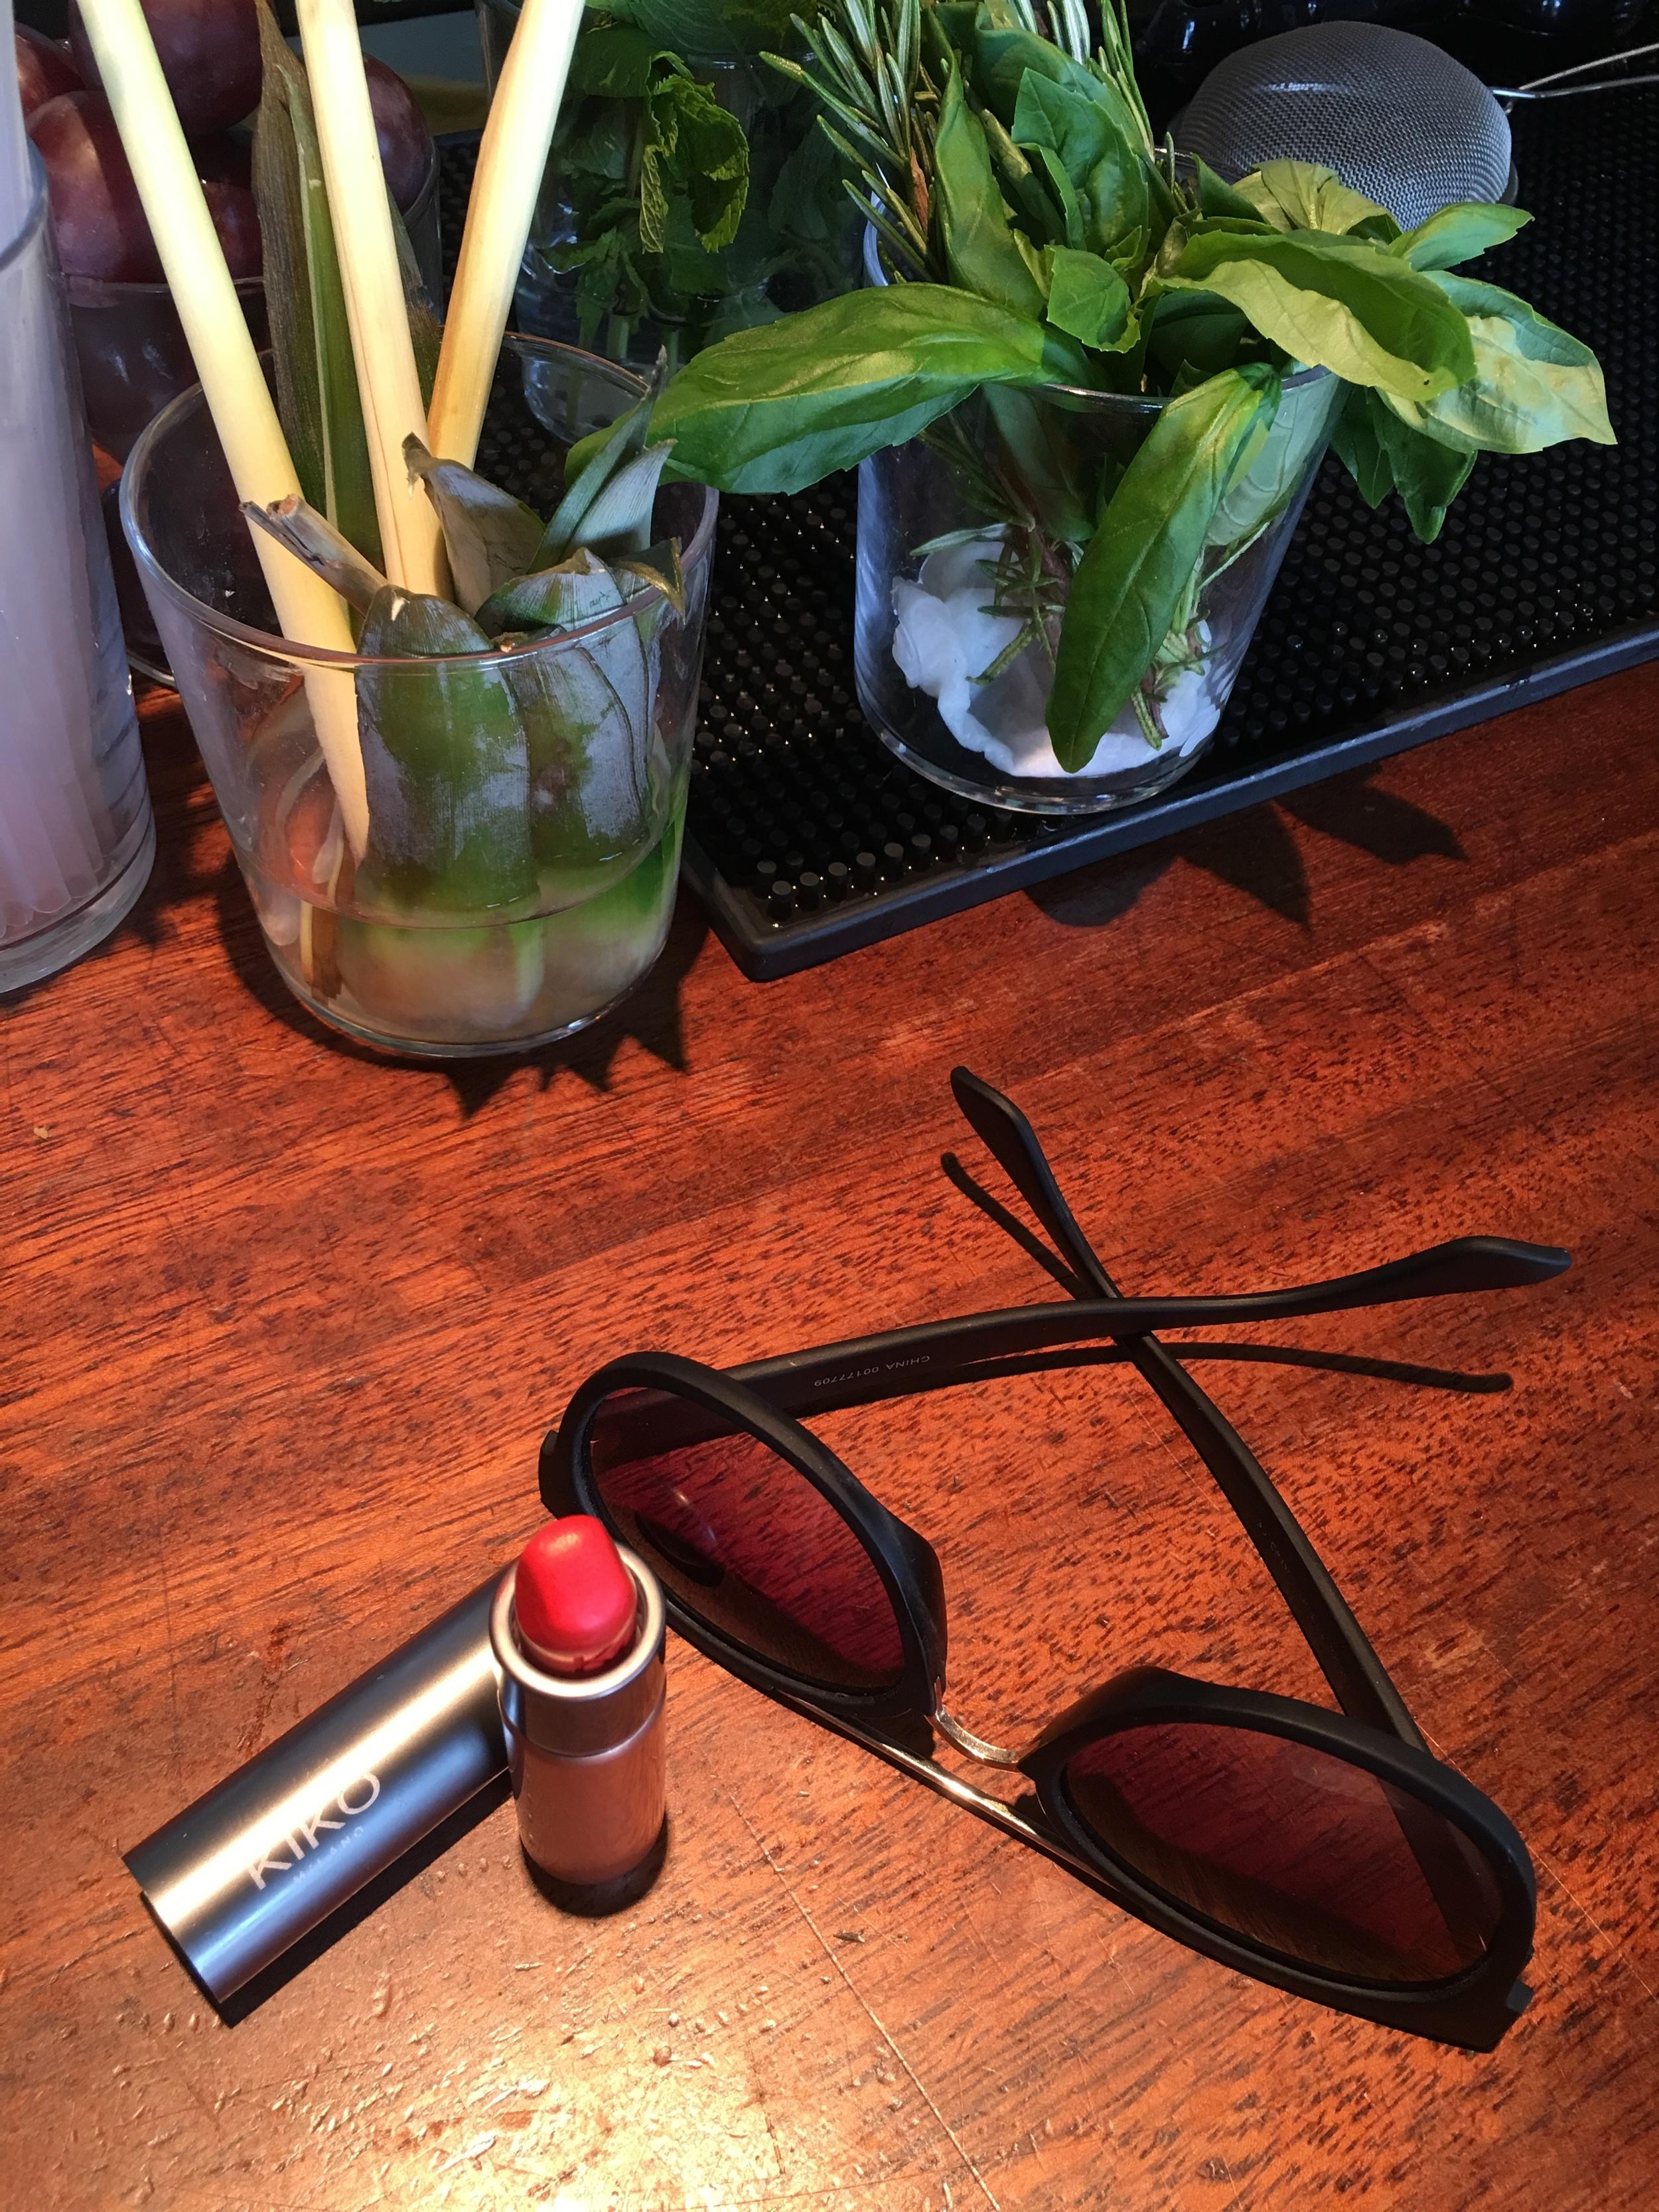 Kiko Milano Cosmetics lipstick